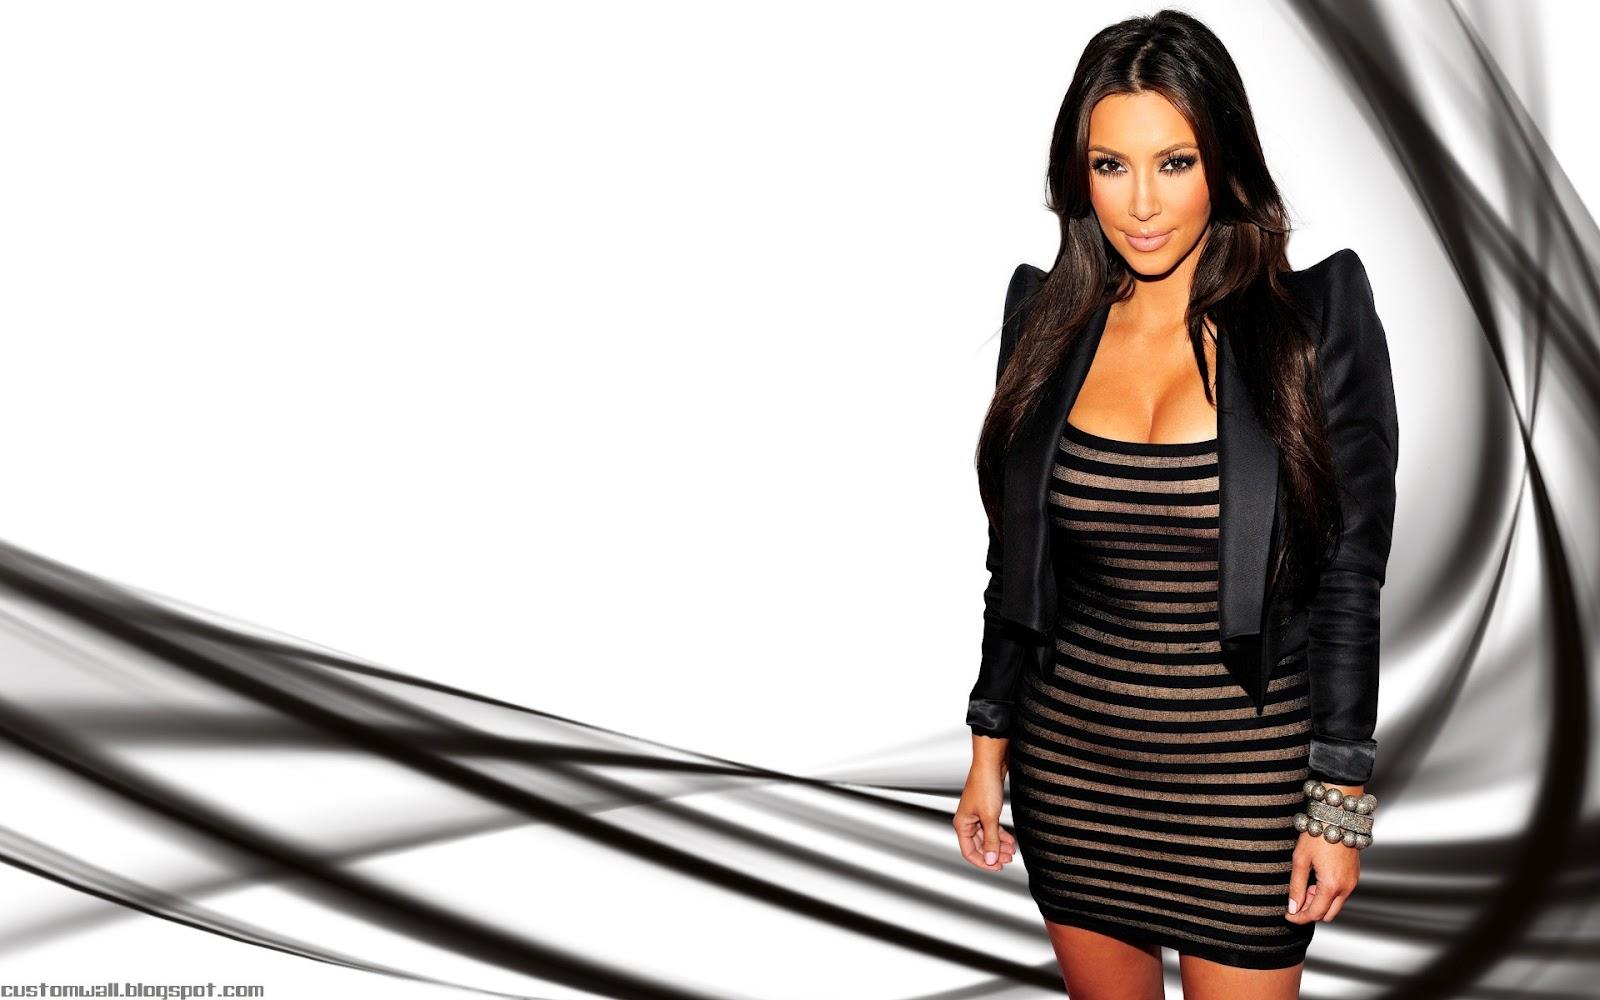 kim kardashian kim kardashian wallpaper widescreen Hd kim kardashian 1600x1000